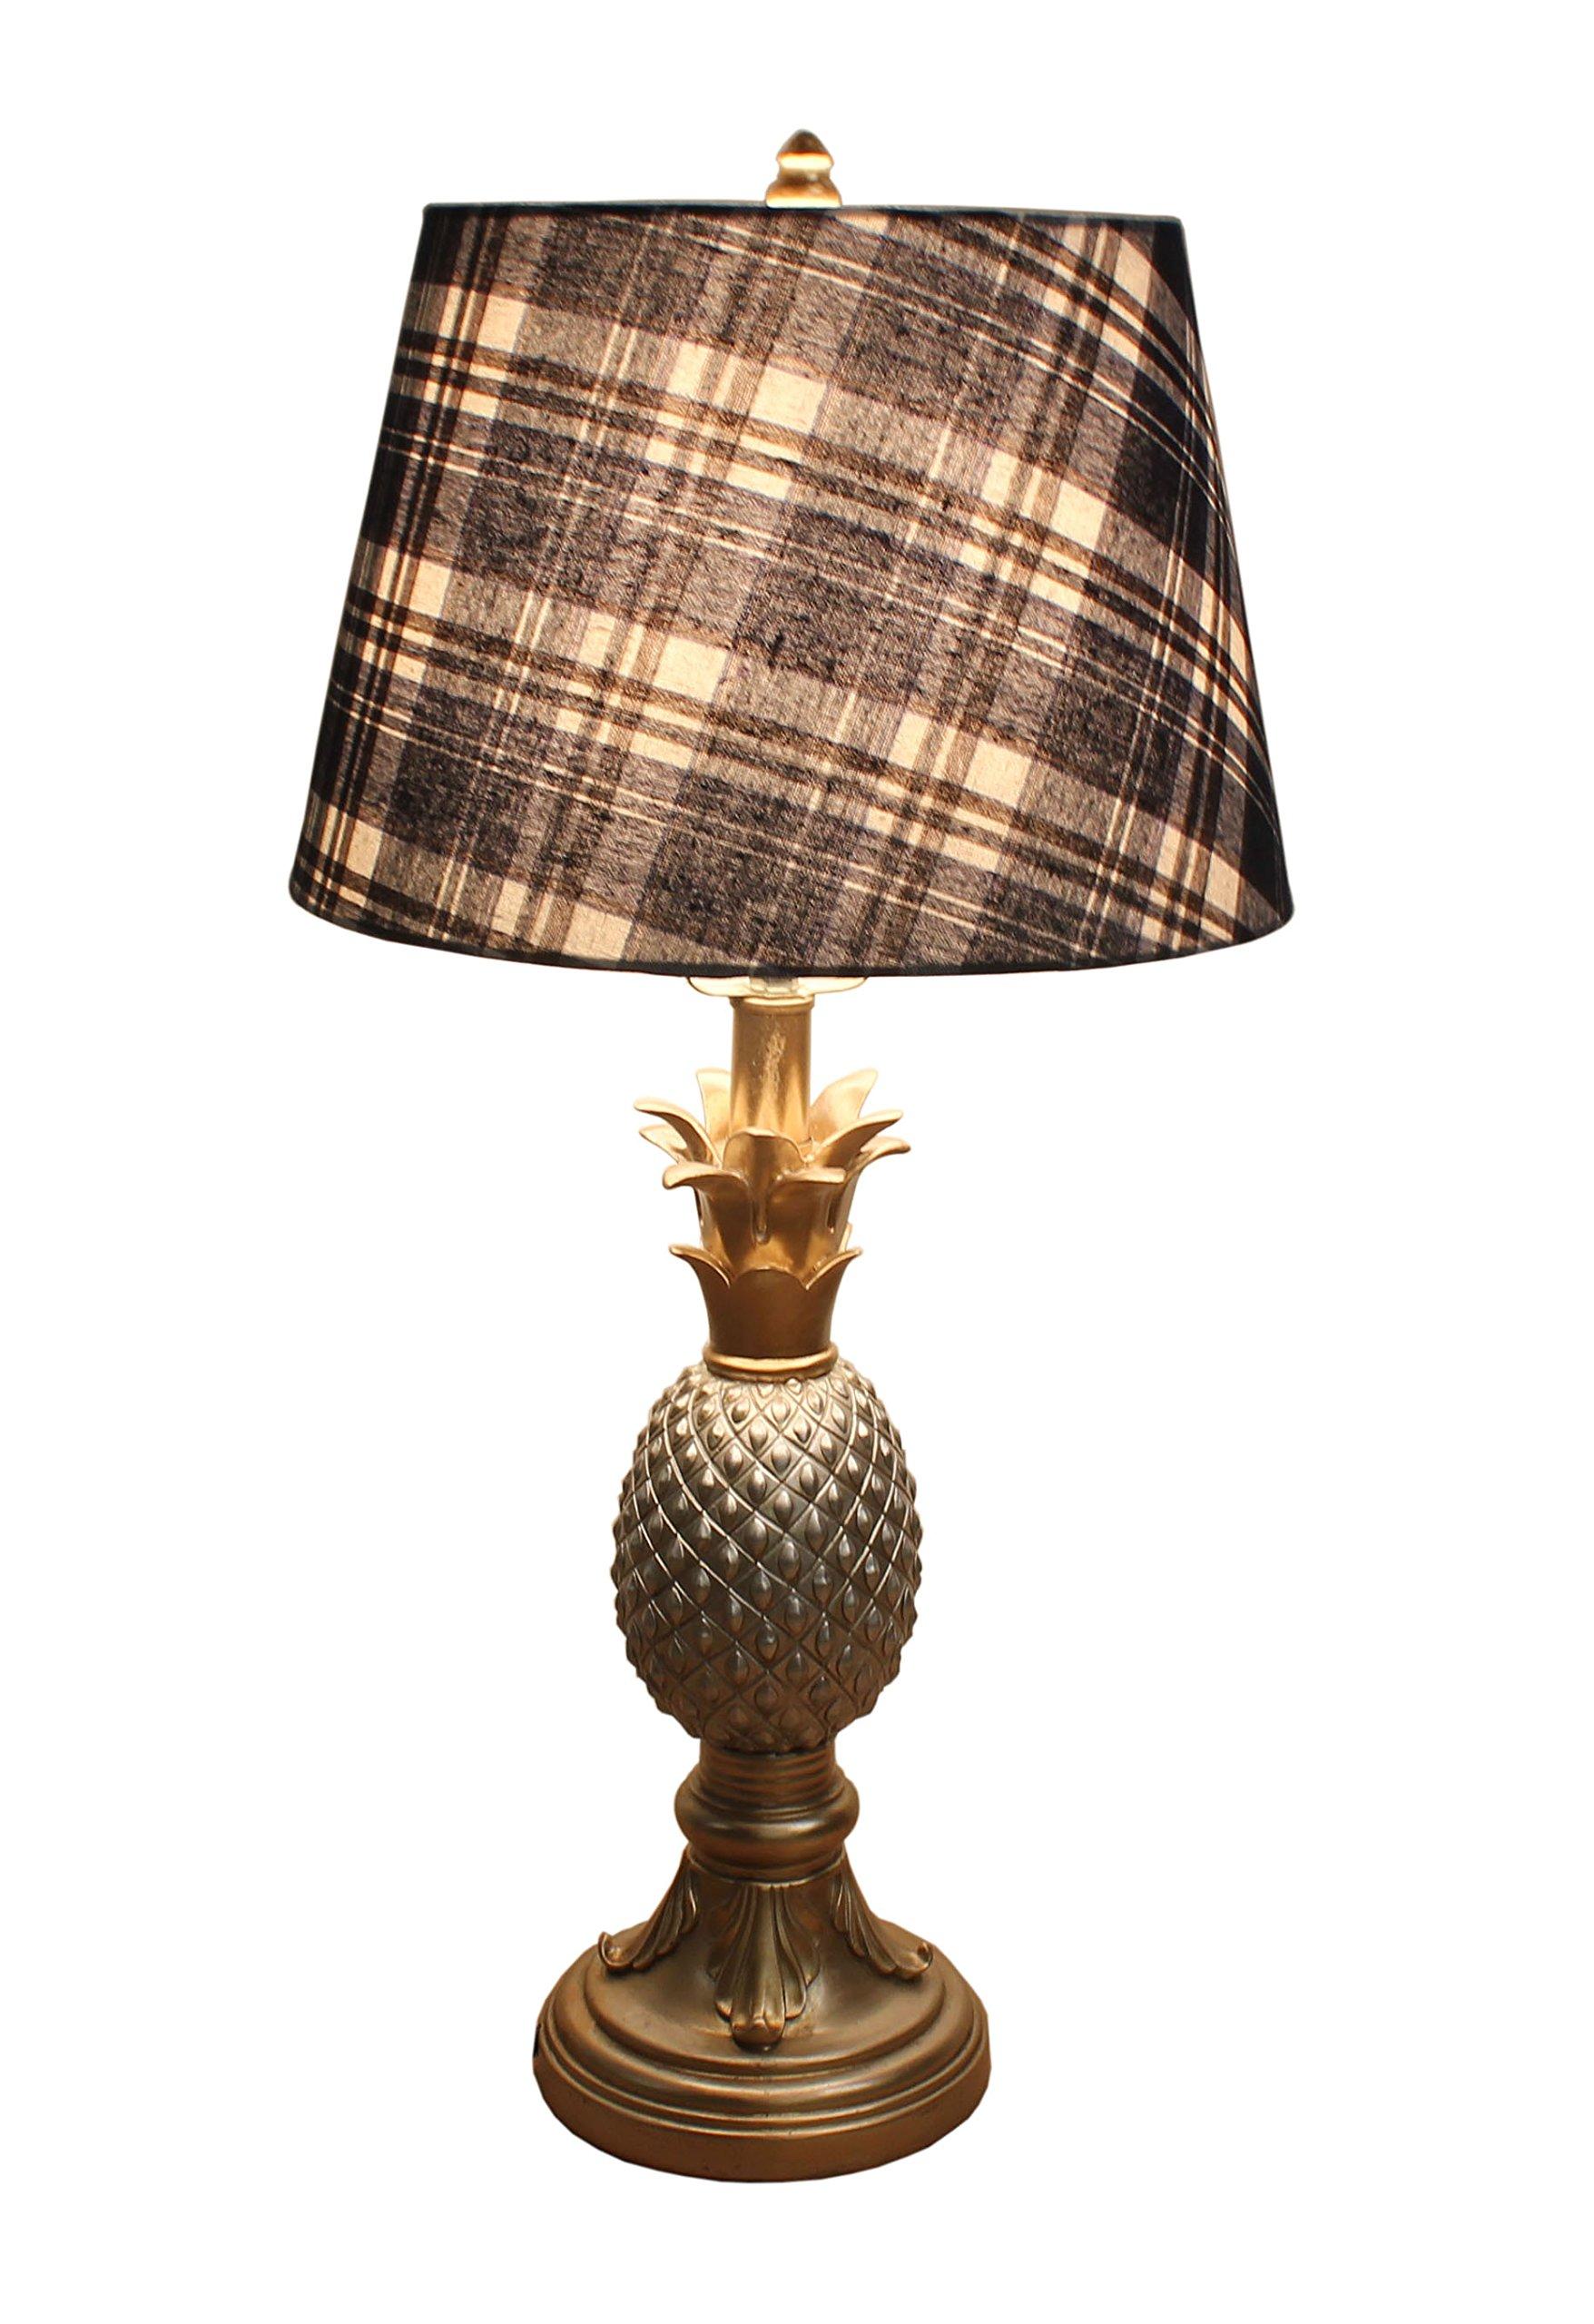 us room pineapple lamps living vintage table lamp sitting